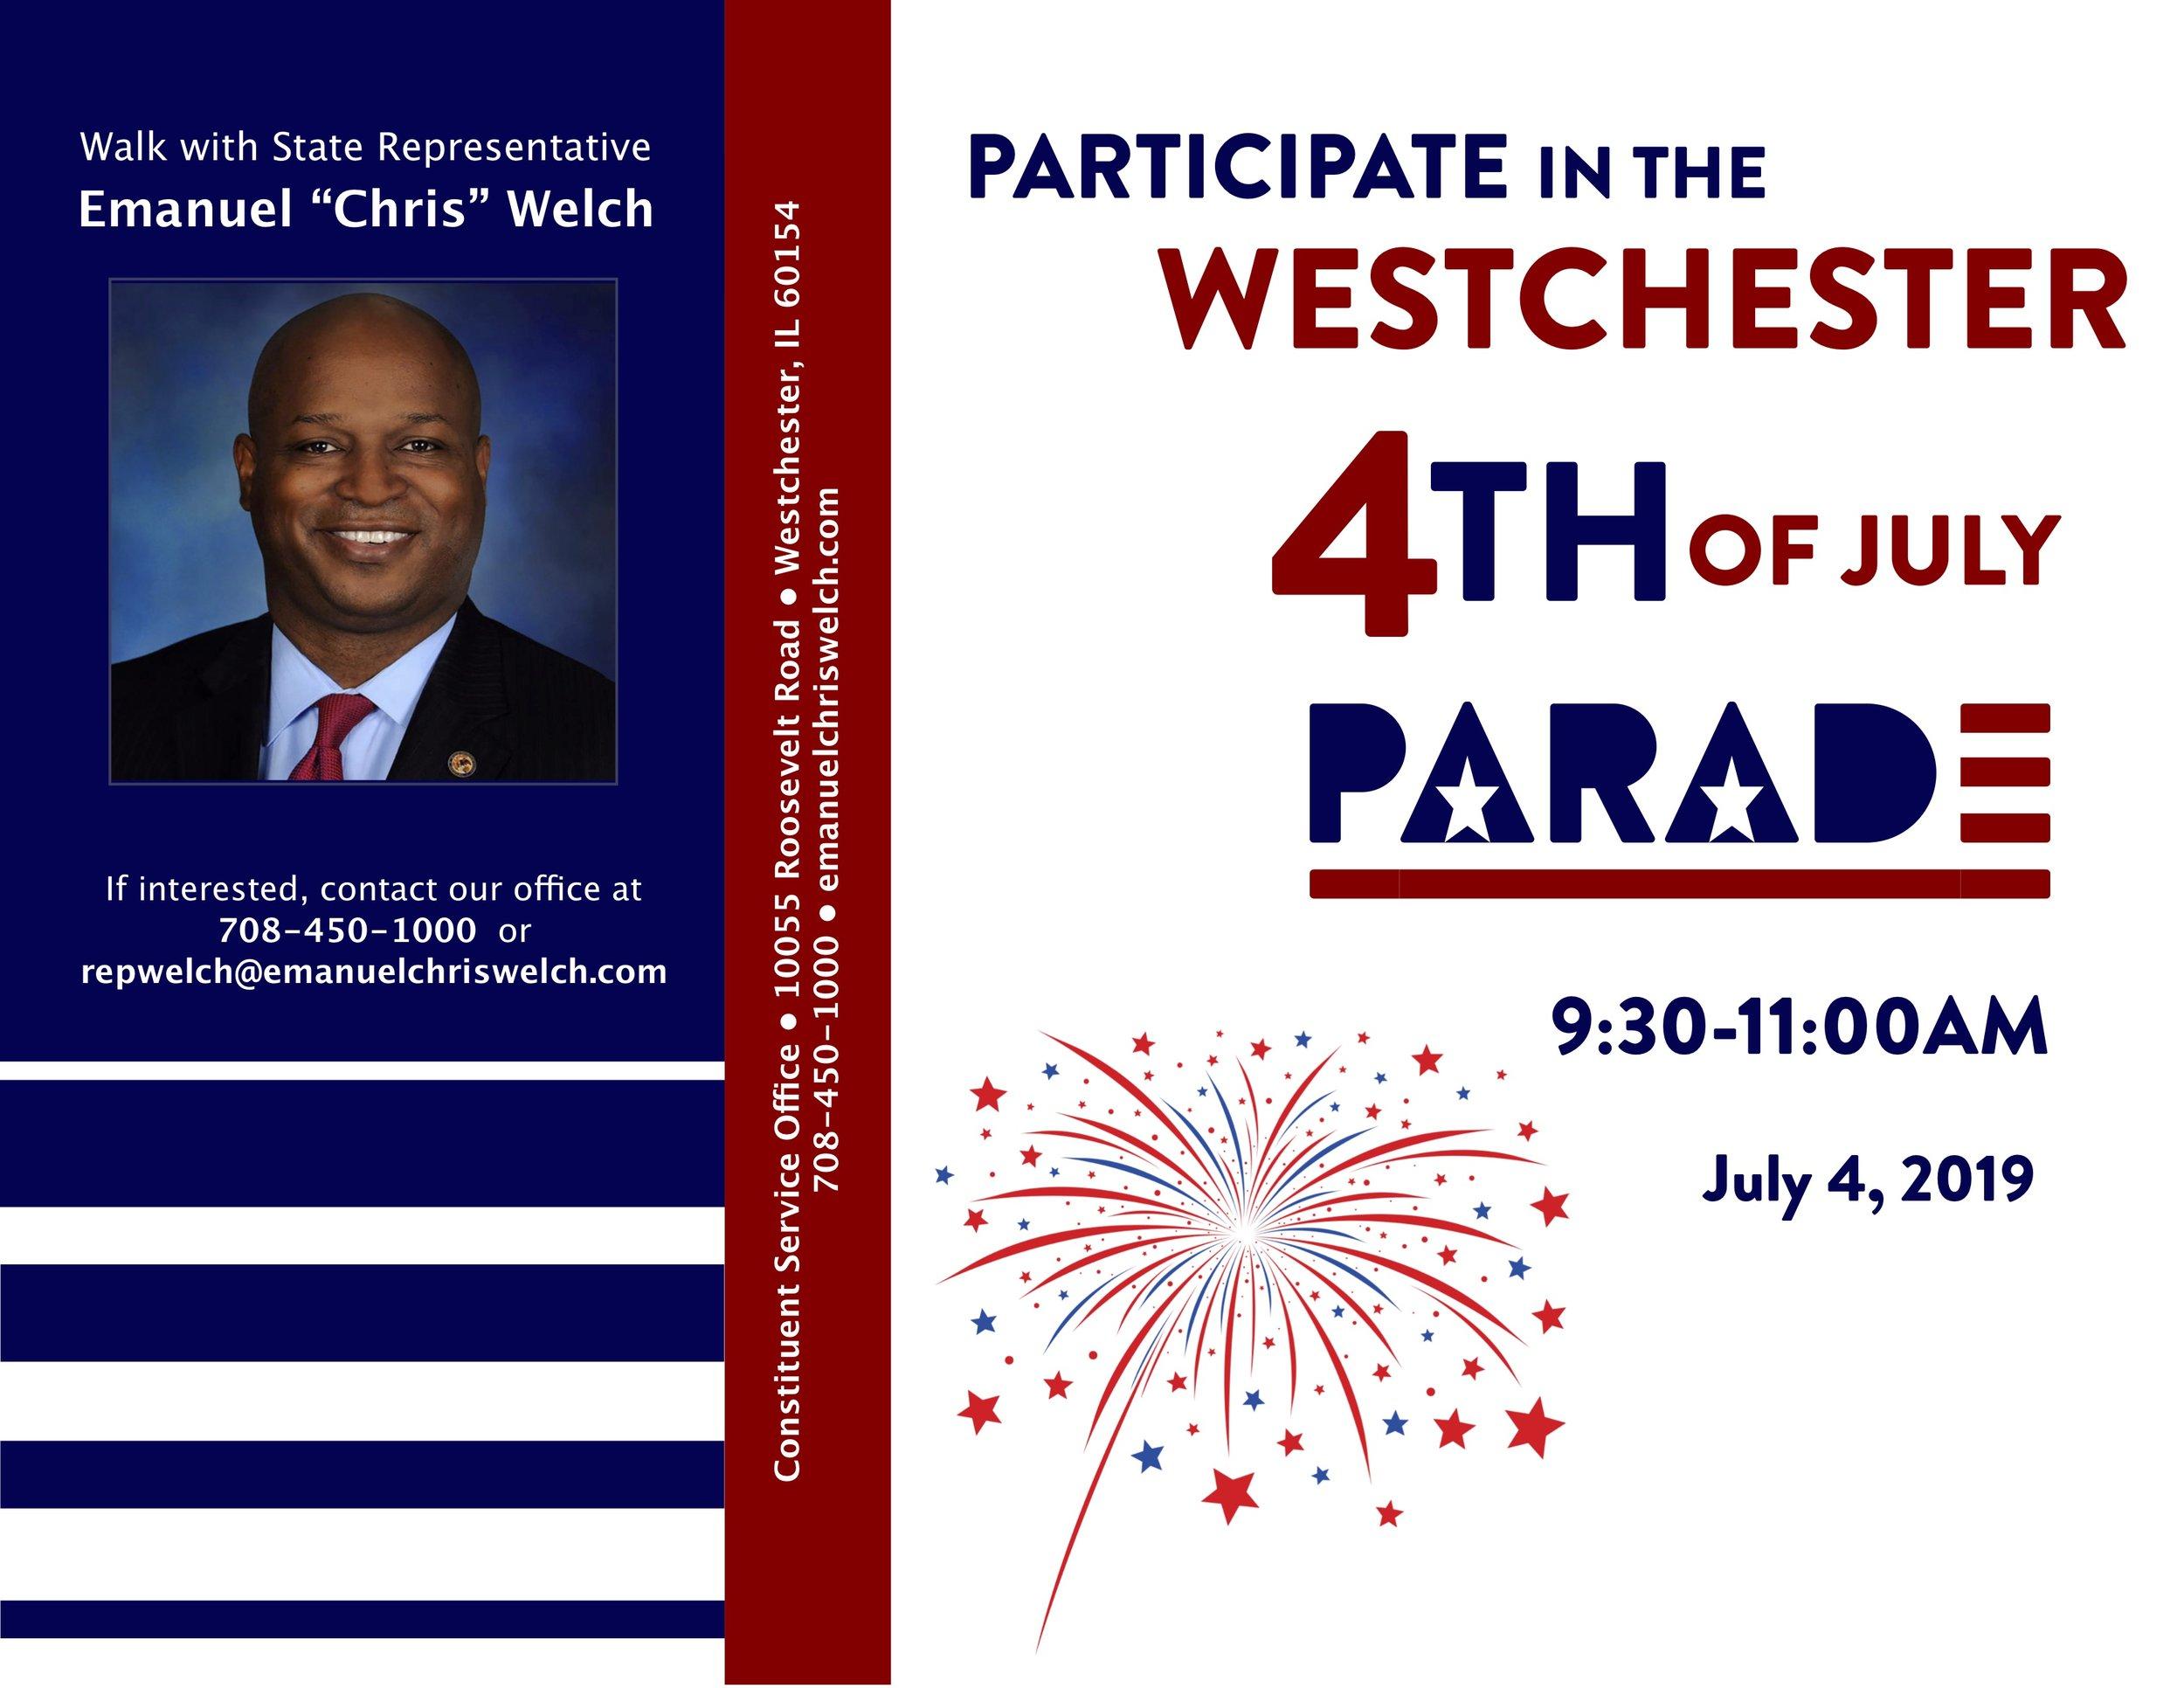 WELCH JULY 4 WESTCHESTER PARADE FLYER.jpg